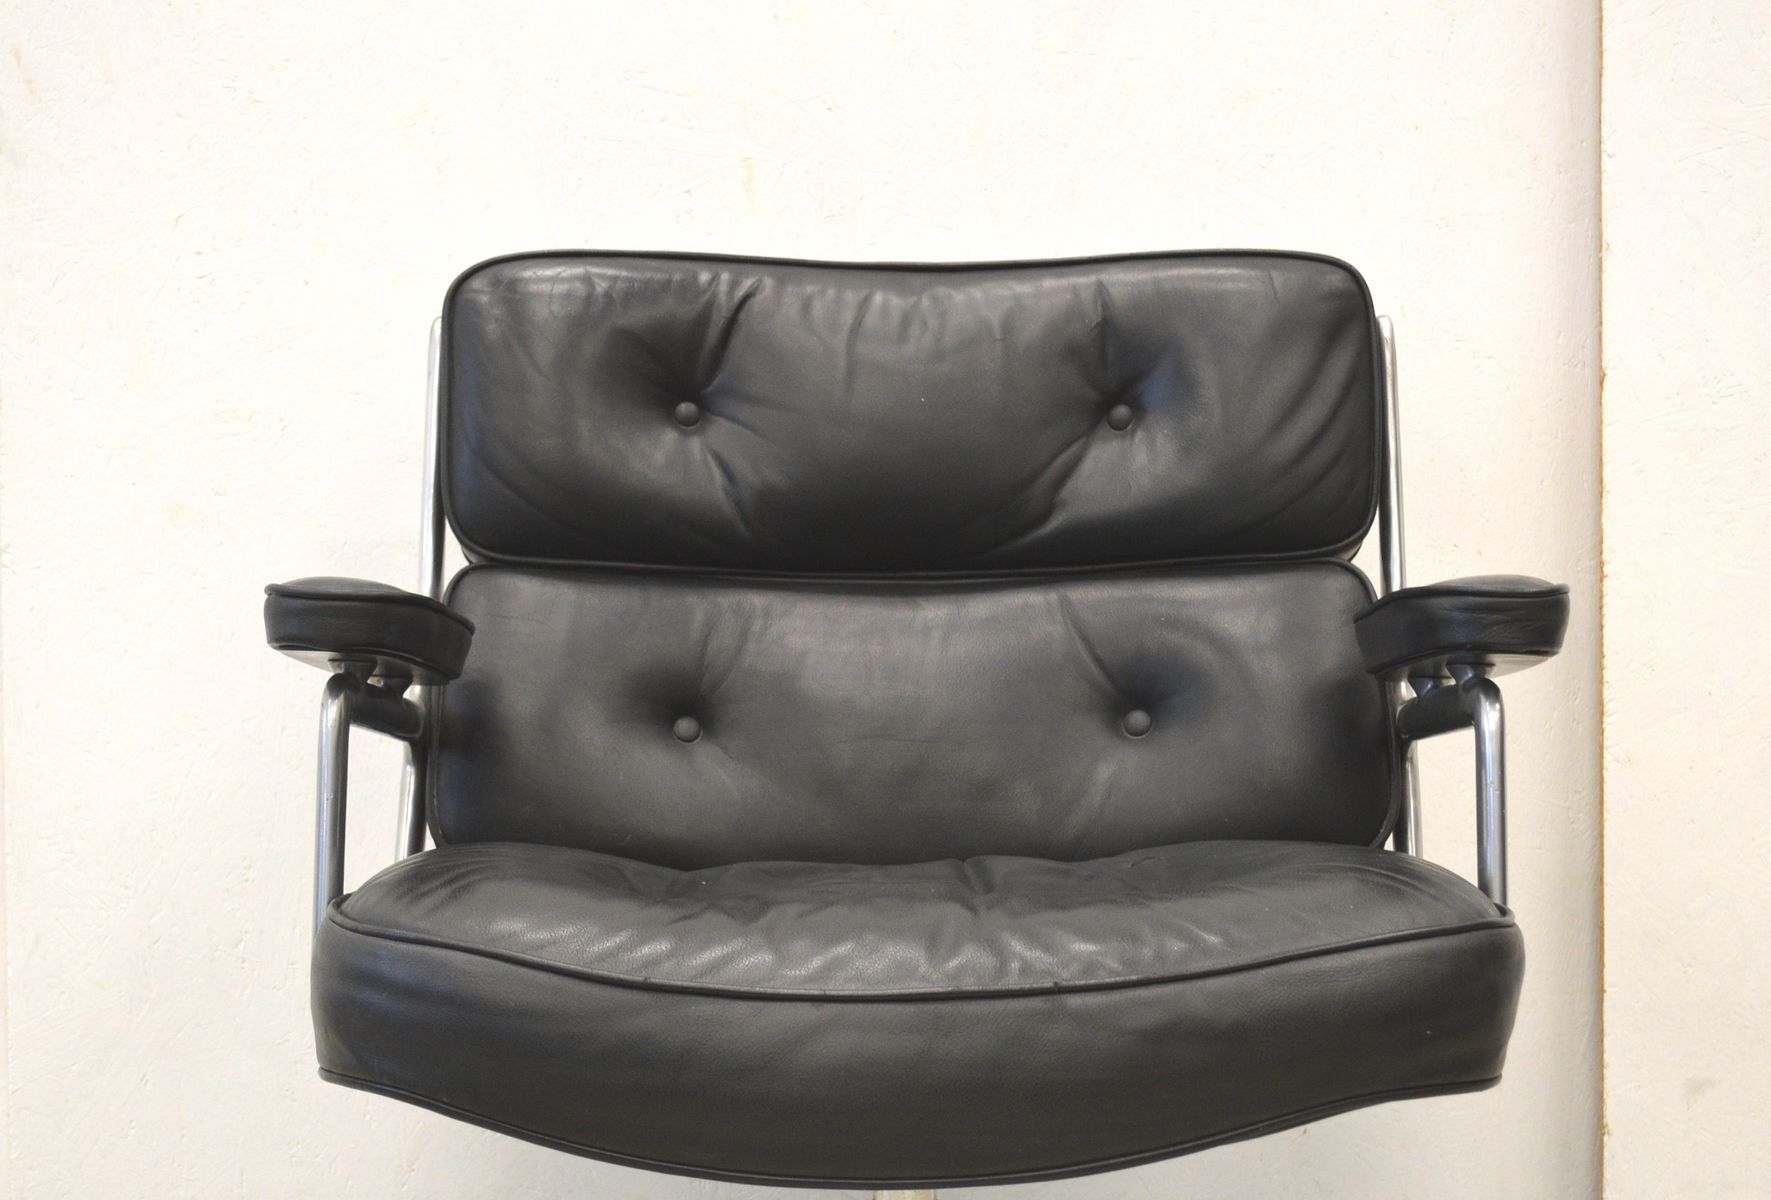 amerikanischer modell es105 lobby sessel von charles ray eames f r herman miller 1970er bei. Black Bedroom Furniture Sets. Home Design Ideas